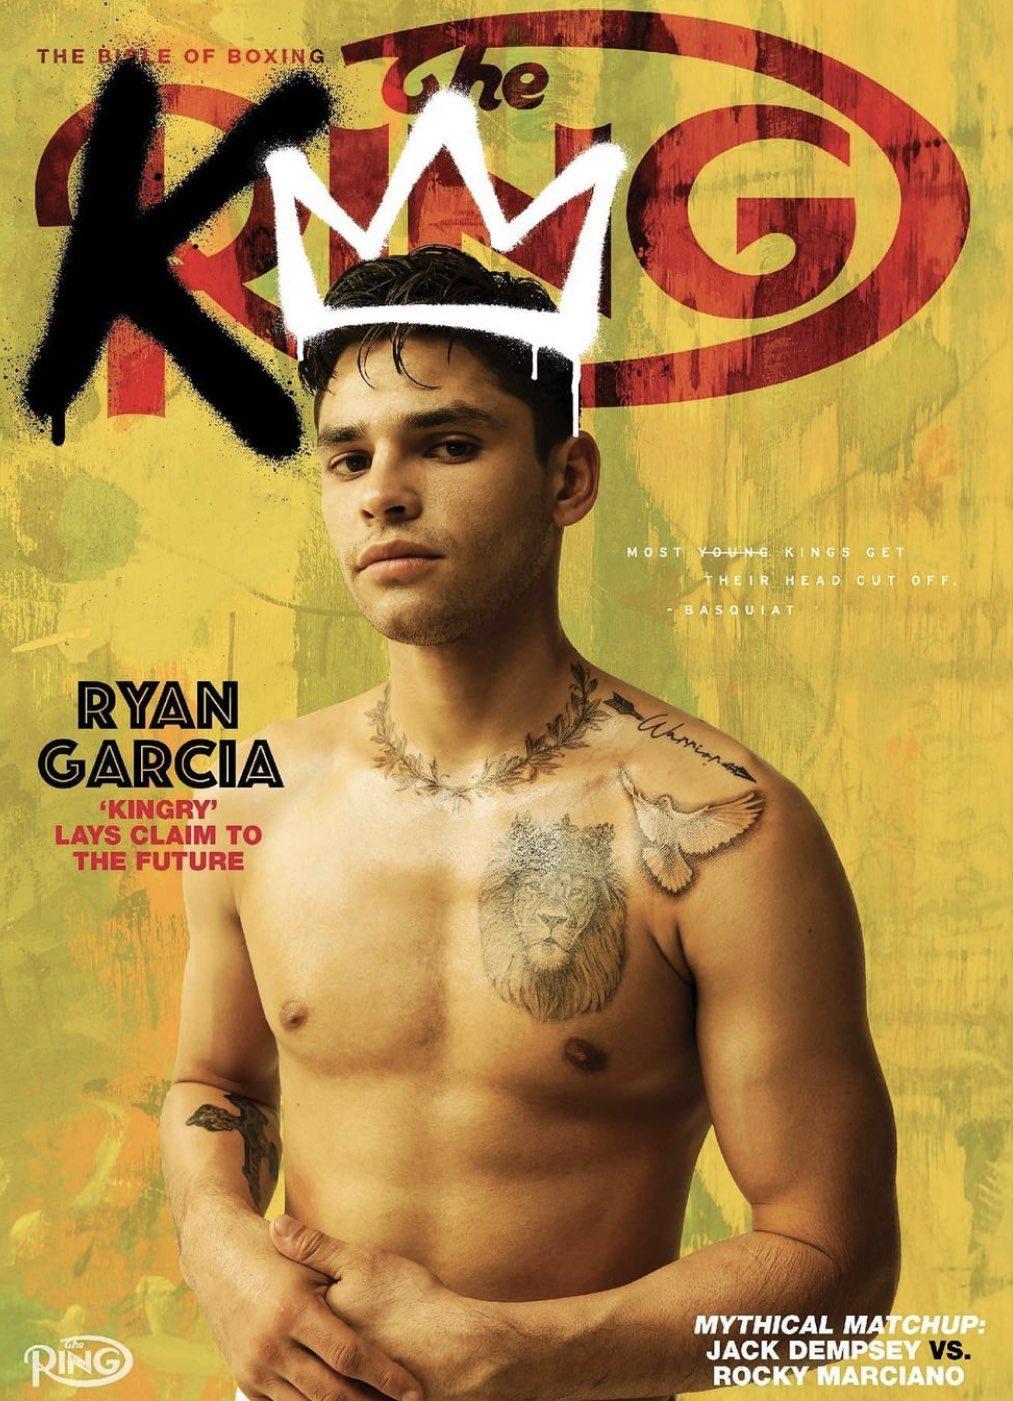 "Oscar De La Hoya on Twitter: ""Ryan Garcia on the cover of @ringmagazine 🔥 Pre-order a print copy at https://t.co/ZZaIpsXUP2… """